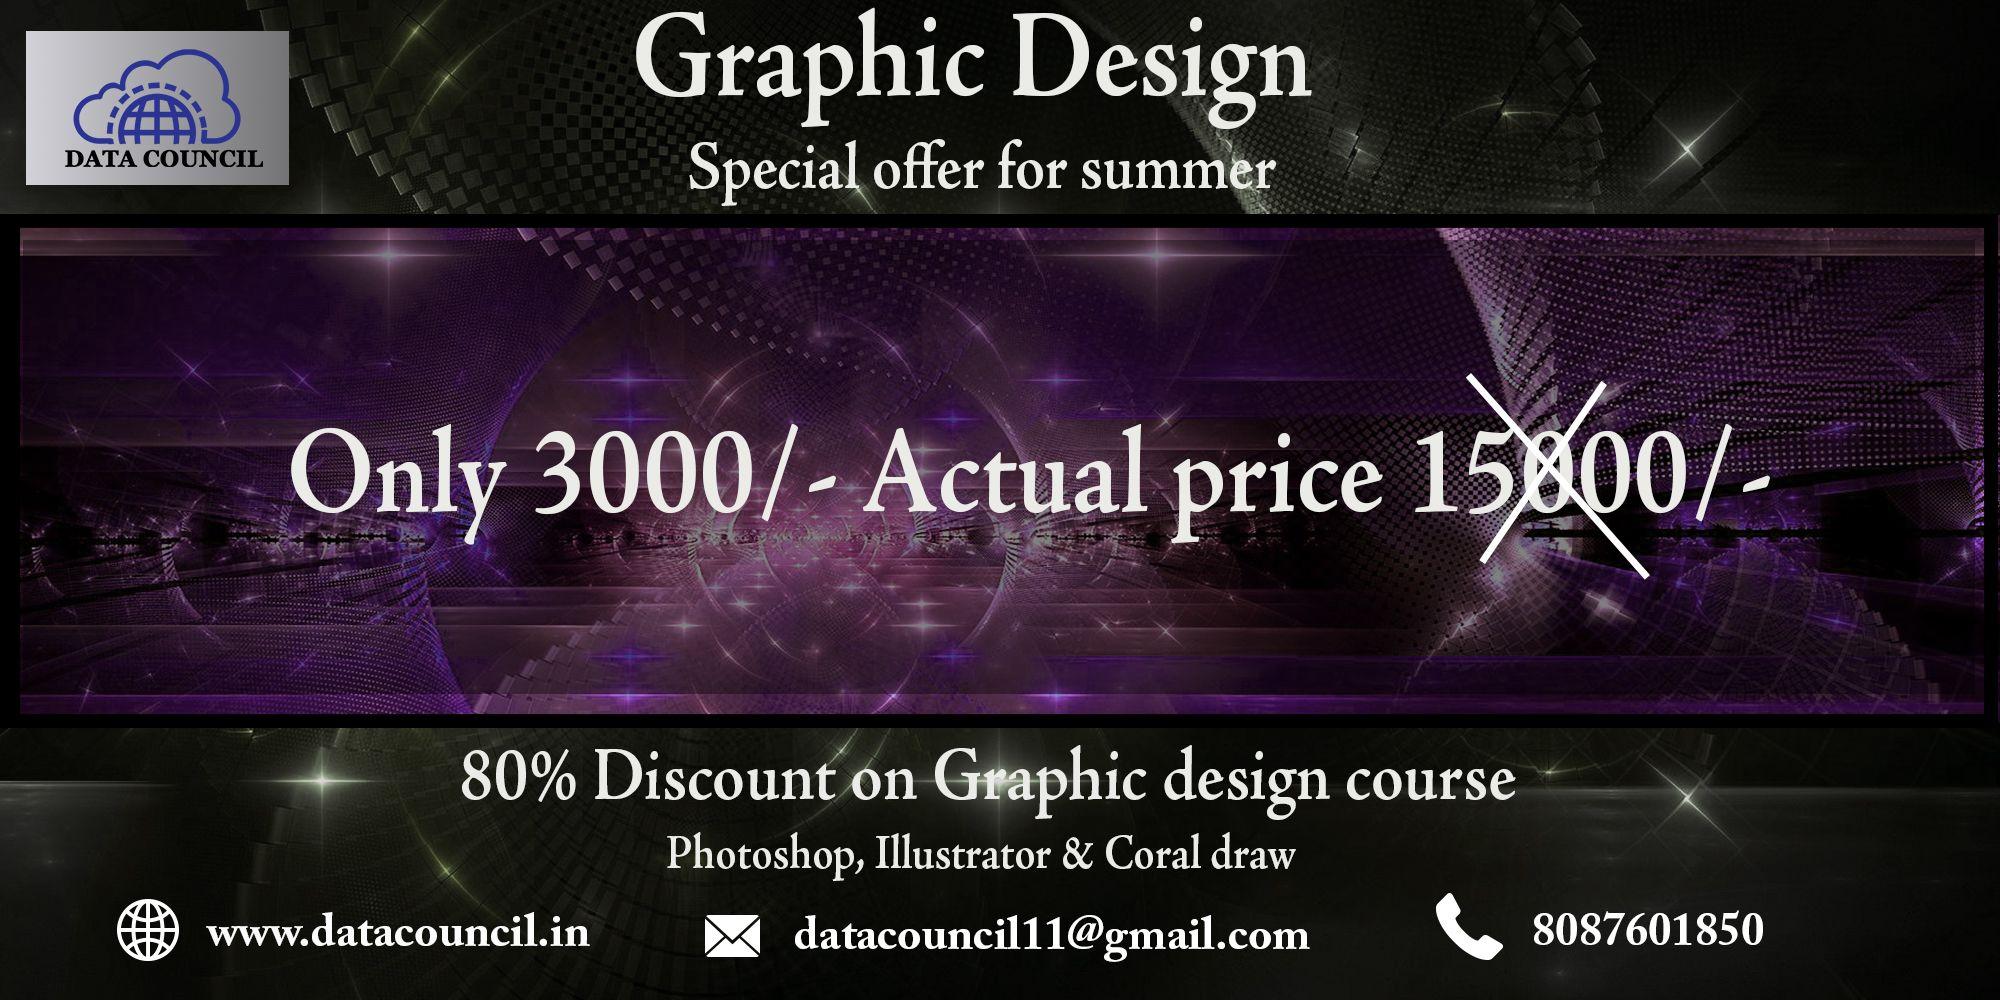 Graphic Design Classes Graphic Design Course Graphic Design Class Training Classes